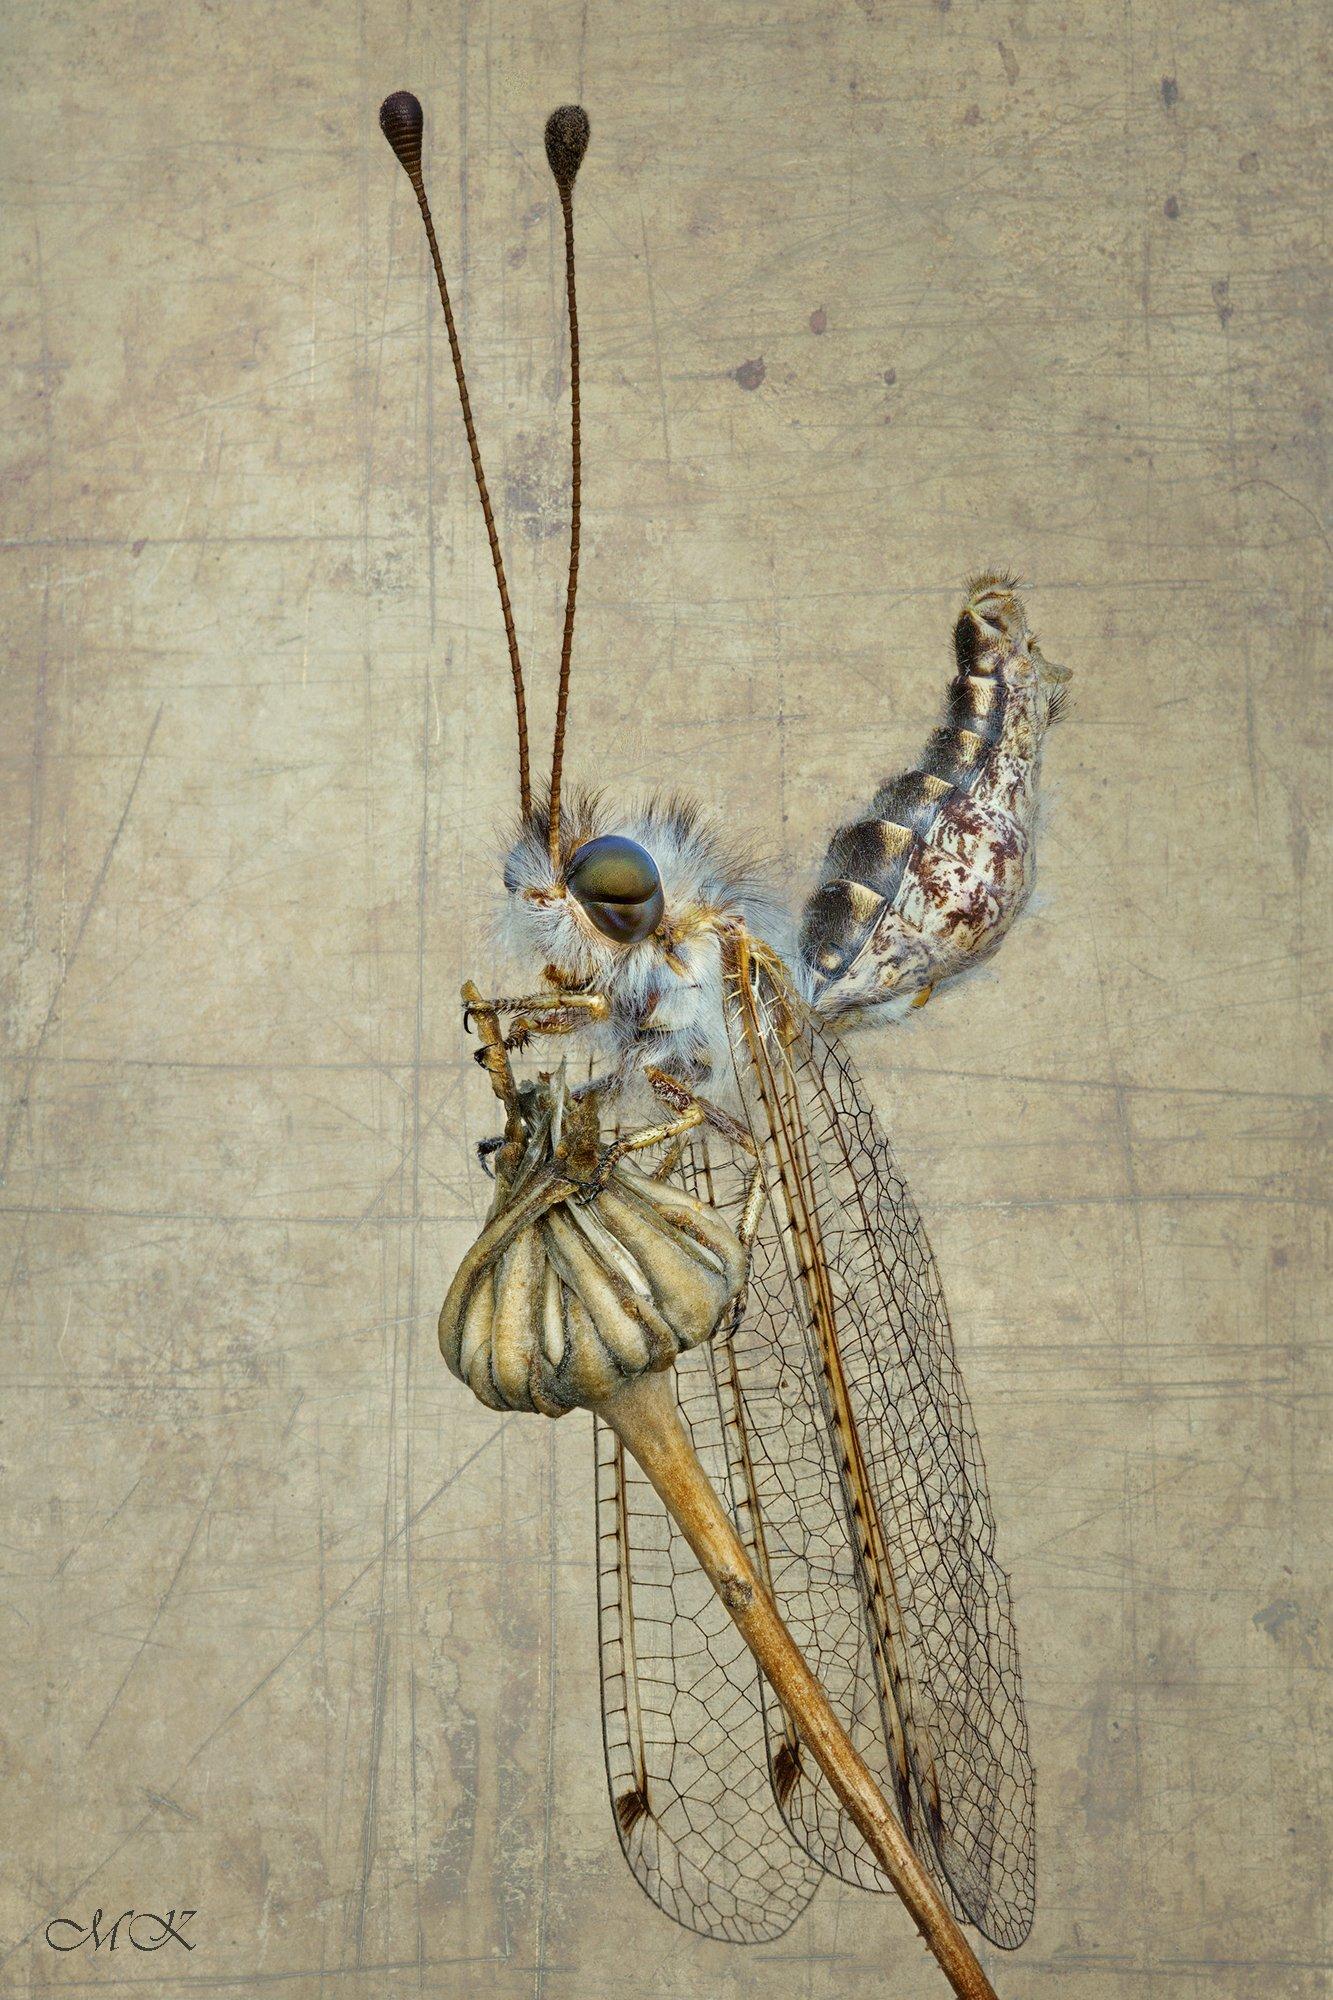 аскалаф, bubopsis andromache, Miron Karlinsky